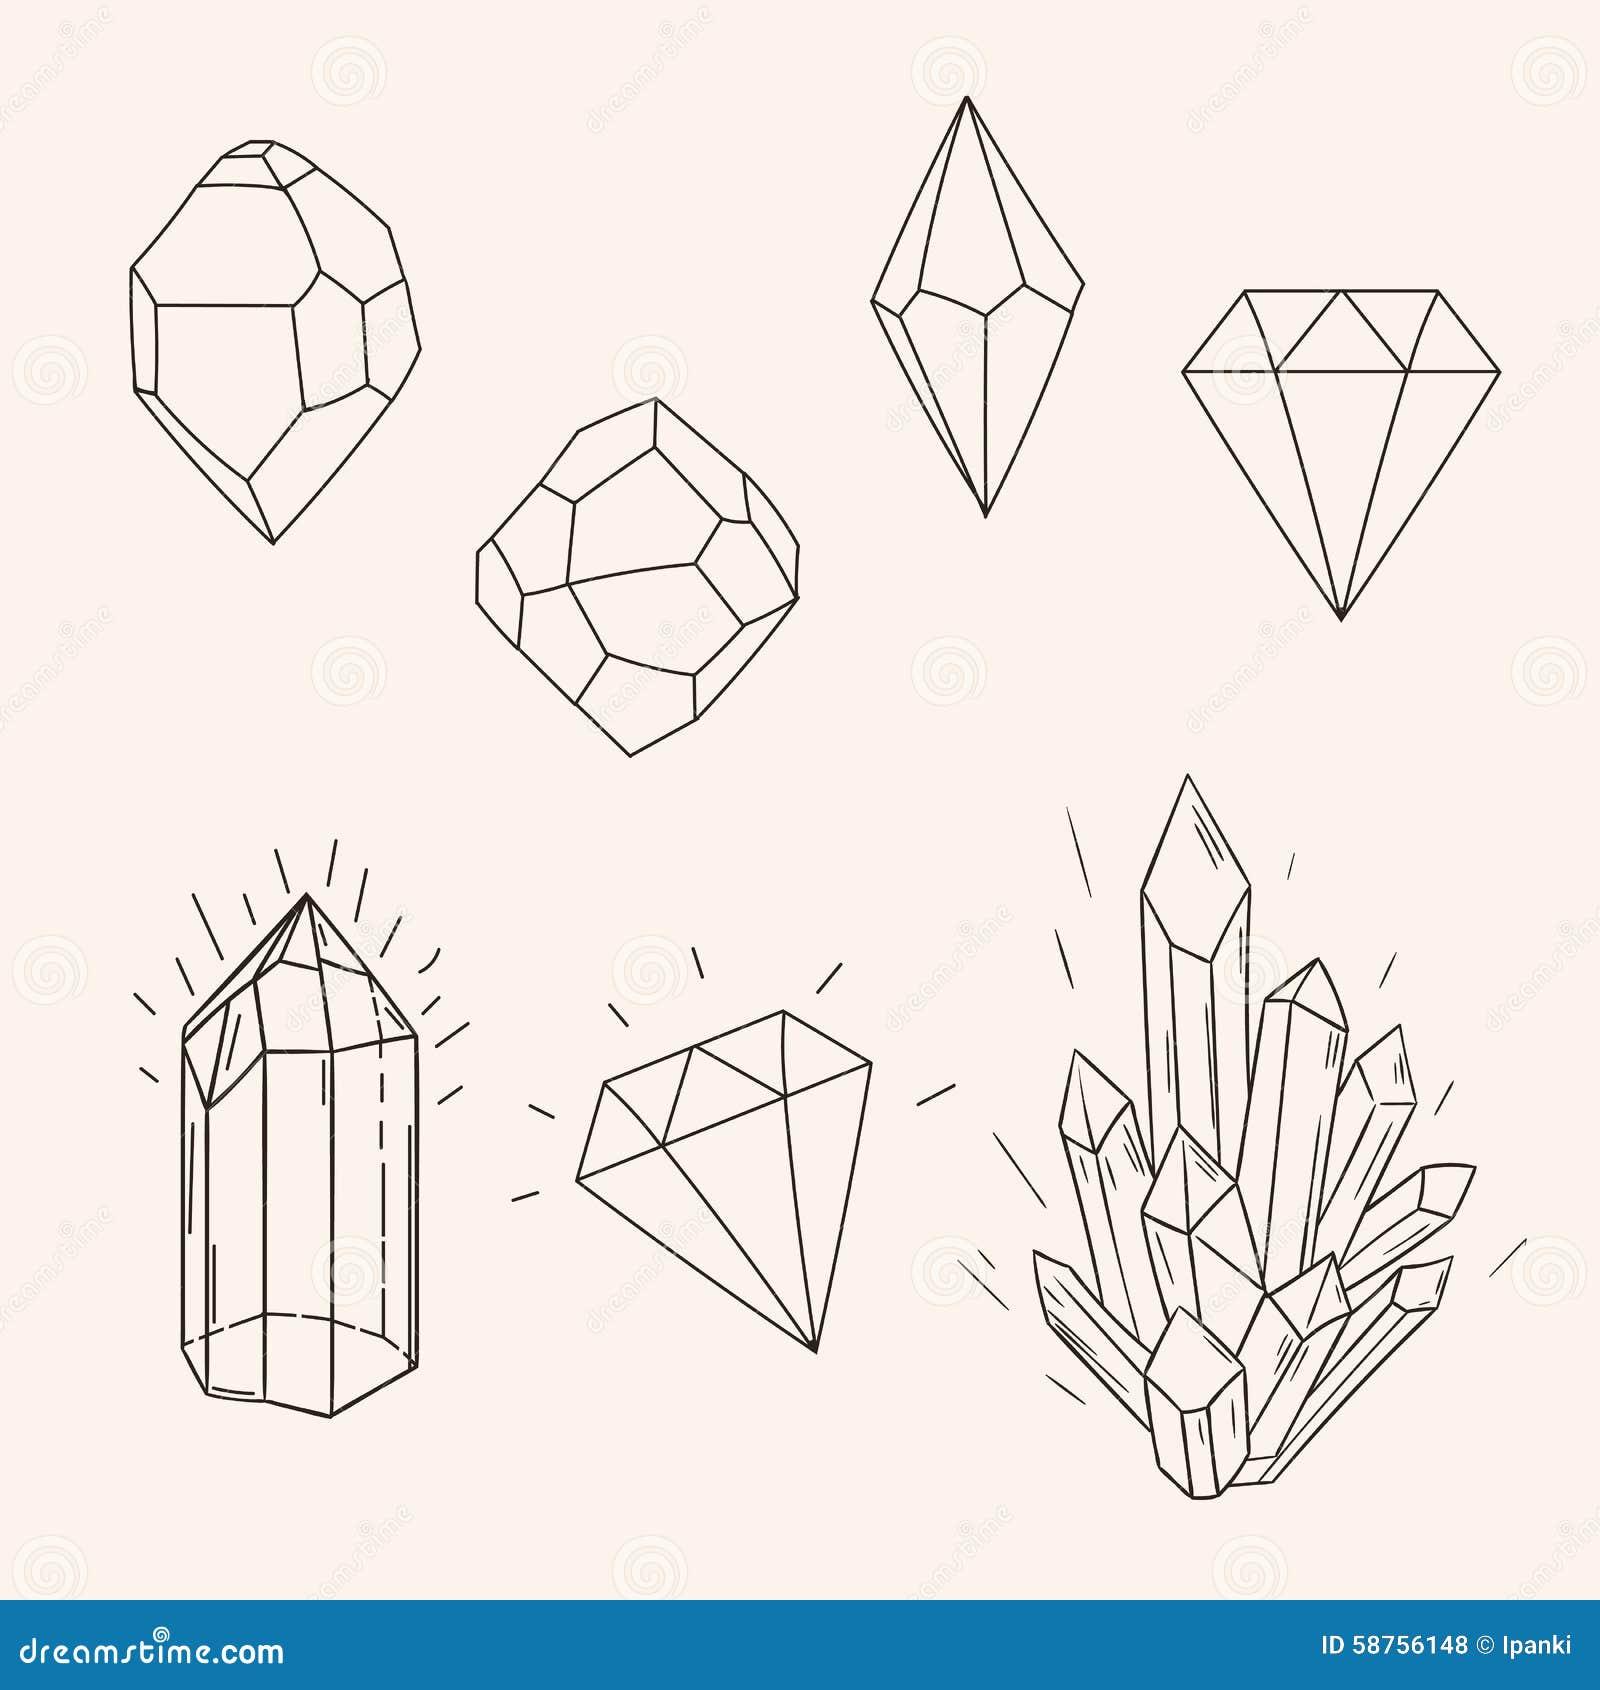 Line Art Vector Design : Hand drawn set sketch crystal diamond and polygonal figure